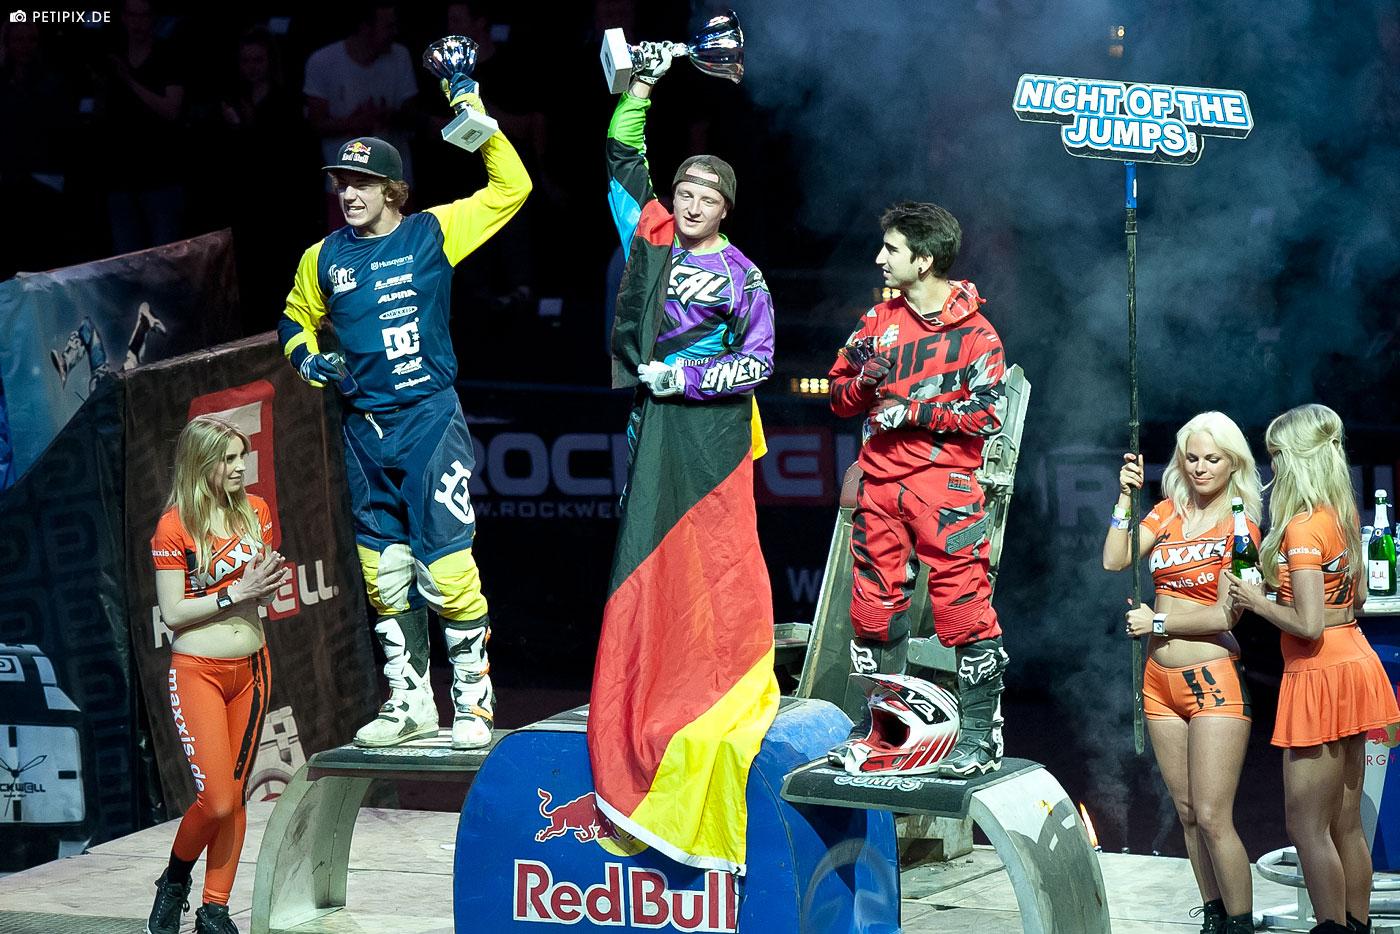 O'NEAL team rider Hannes Ackermann wins Night of the Jumps in Hamburg 2015